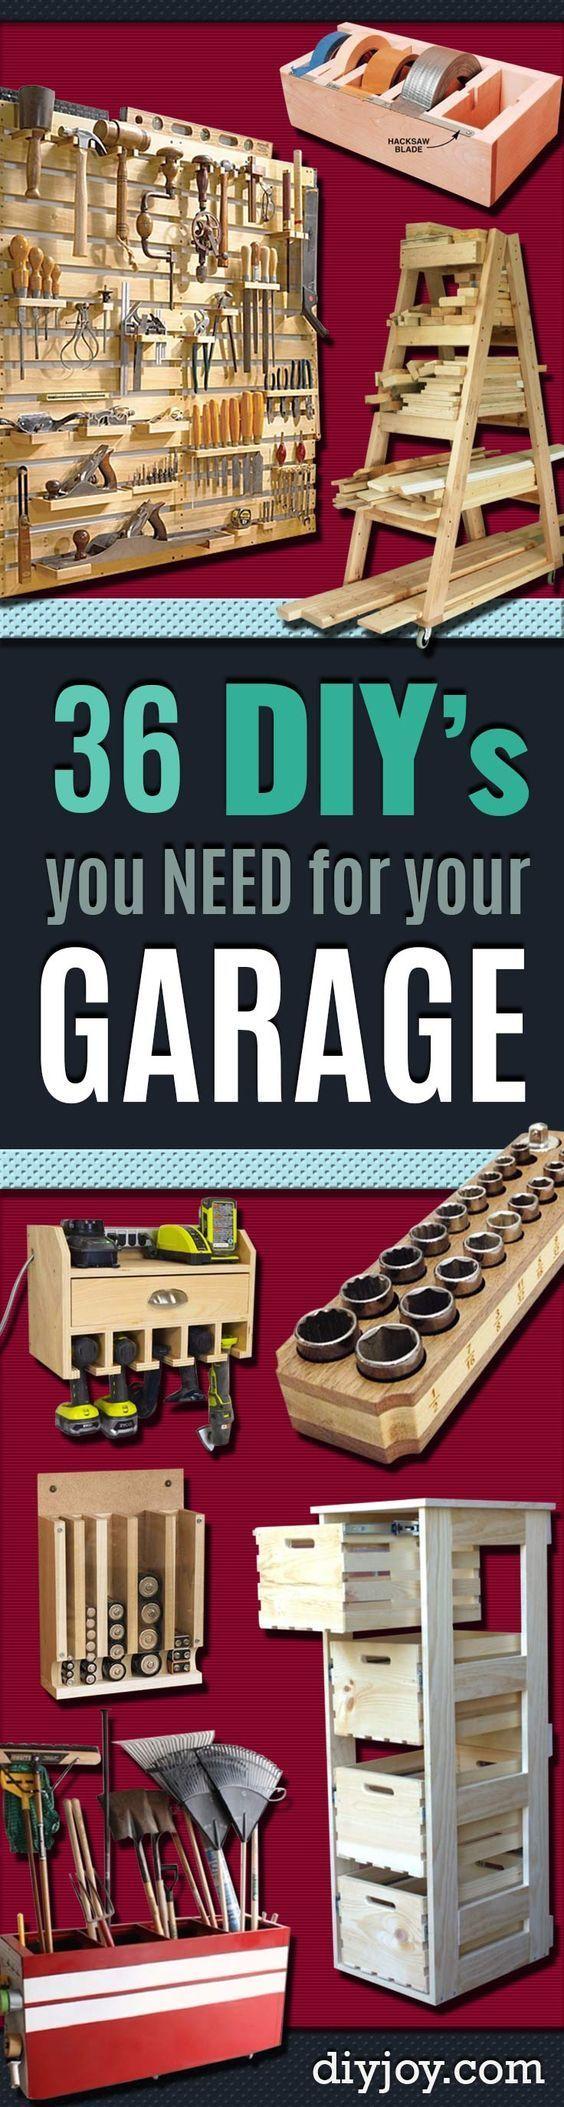 DIY Projects Your Garage Needs -Do It Yourself Garage Makeover Ideas Include Storage, Organization, Shelves, and Project Plans for Cool New Garage Decor http://diyjoy.com/diy-projects-garage mehr zum Selbermachen auf Interessante-dinge.de